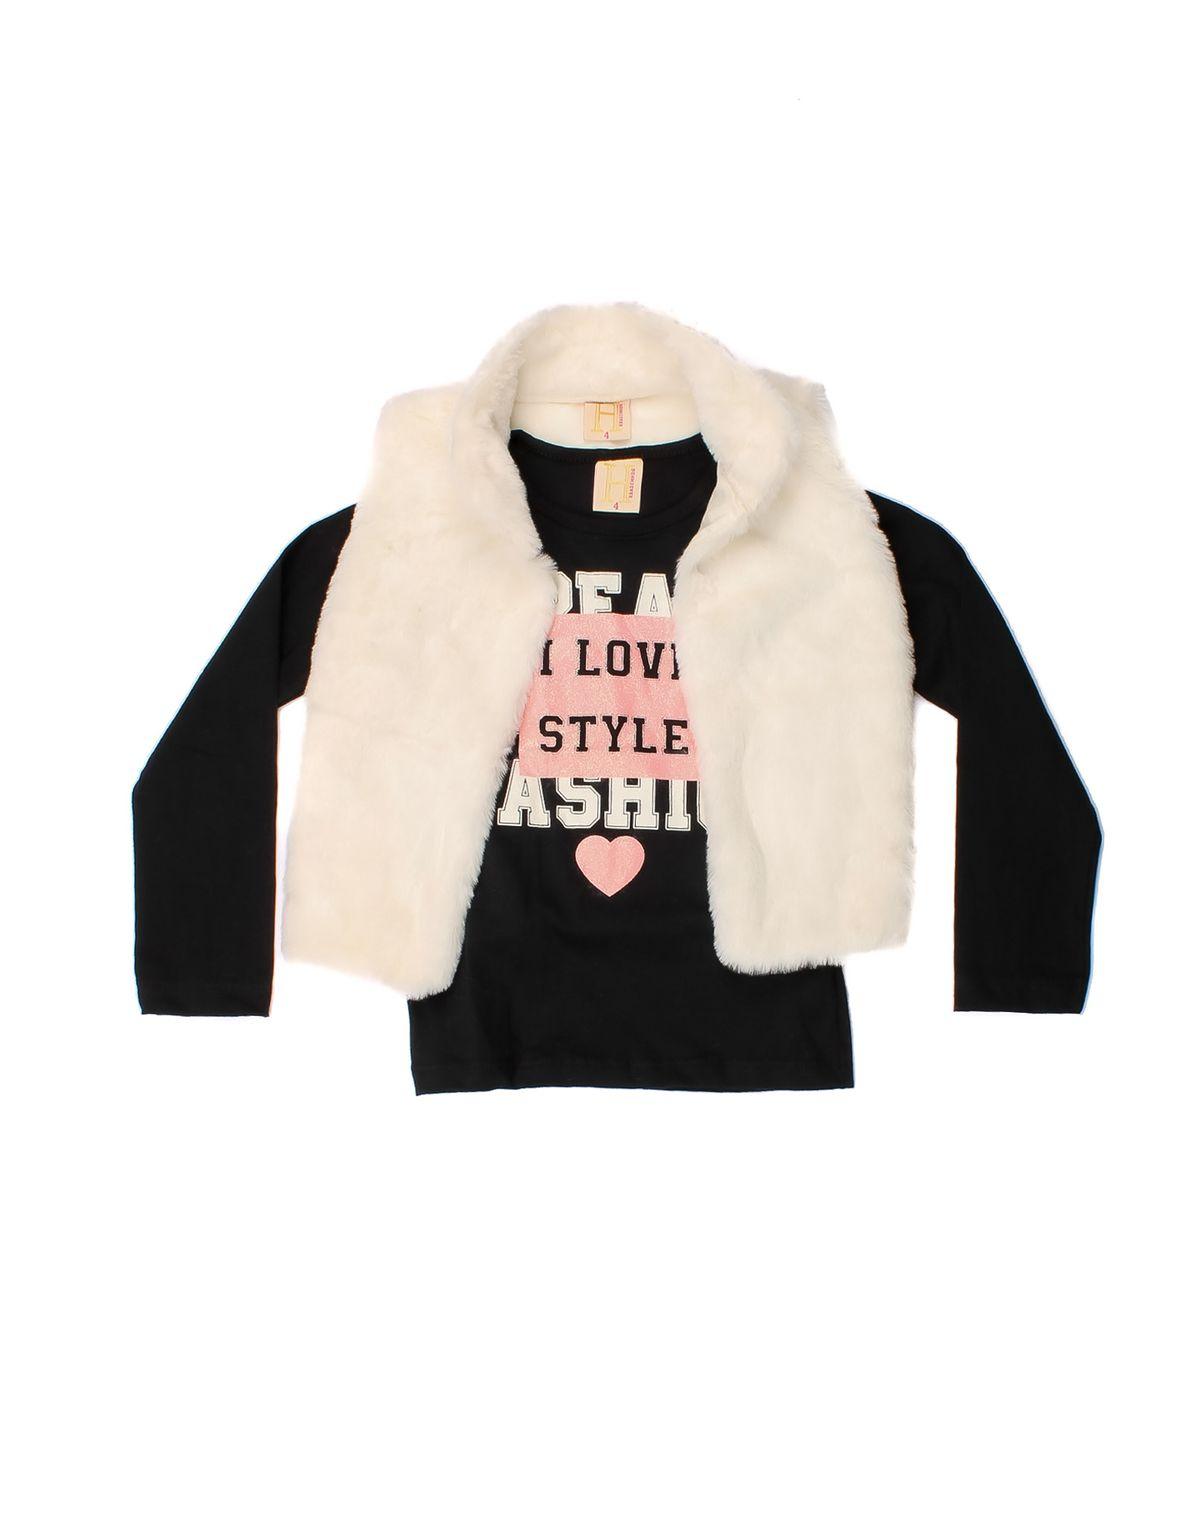 552235001-conjunto-bebe-menina-camiseta-manga-longa-colete-pelucia-preto-off-4-7ac